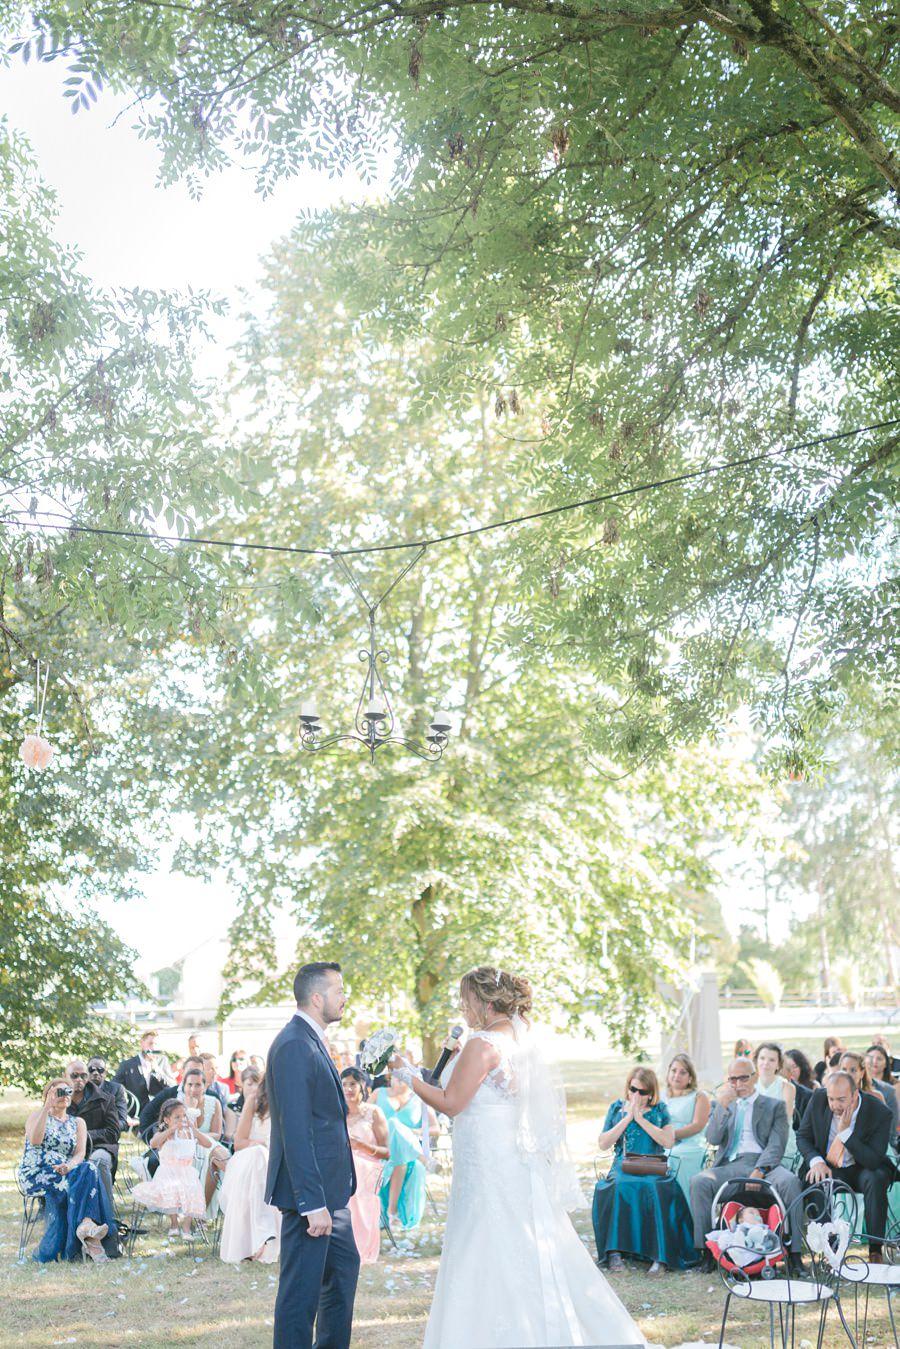 mariage_ferme-de-genievre-elsa-alex-photographe-nicolas_saurin-410_mini